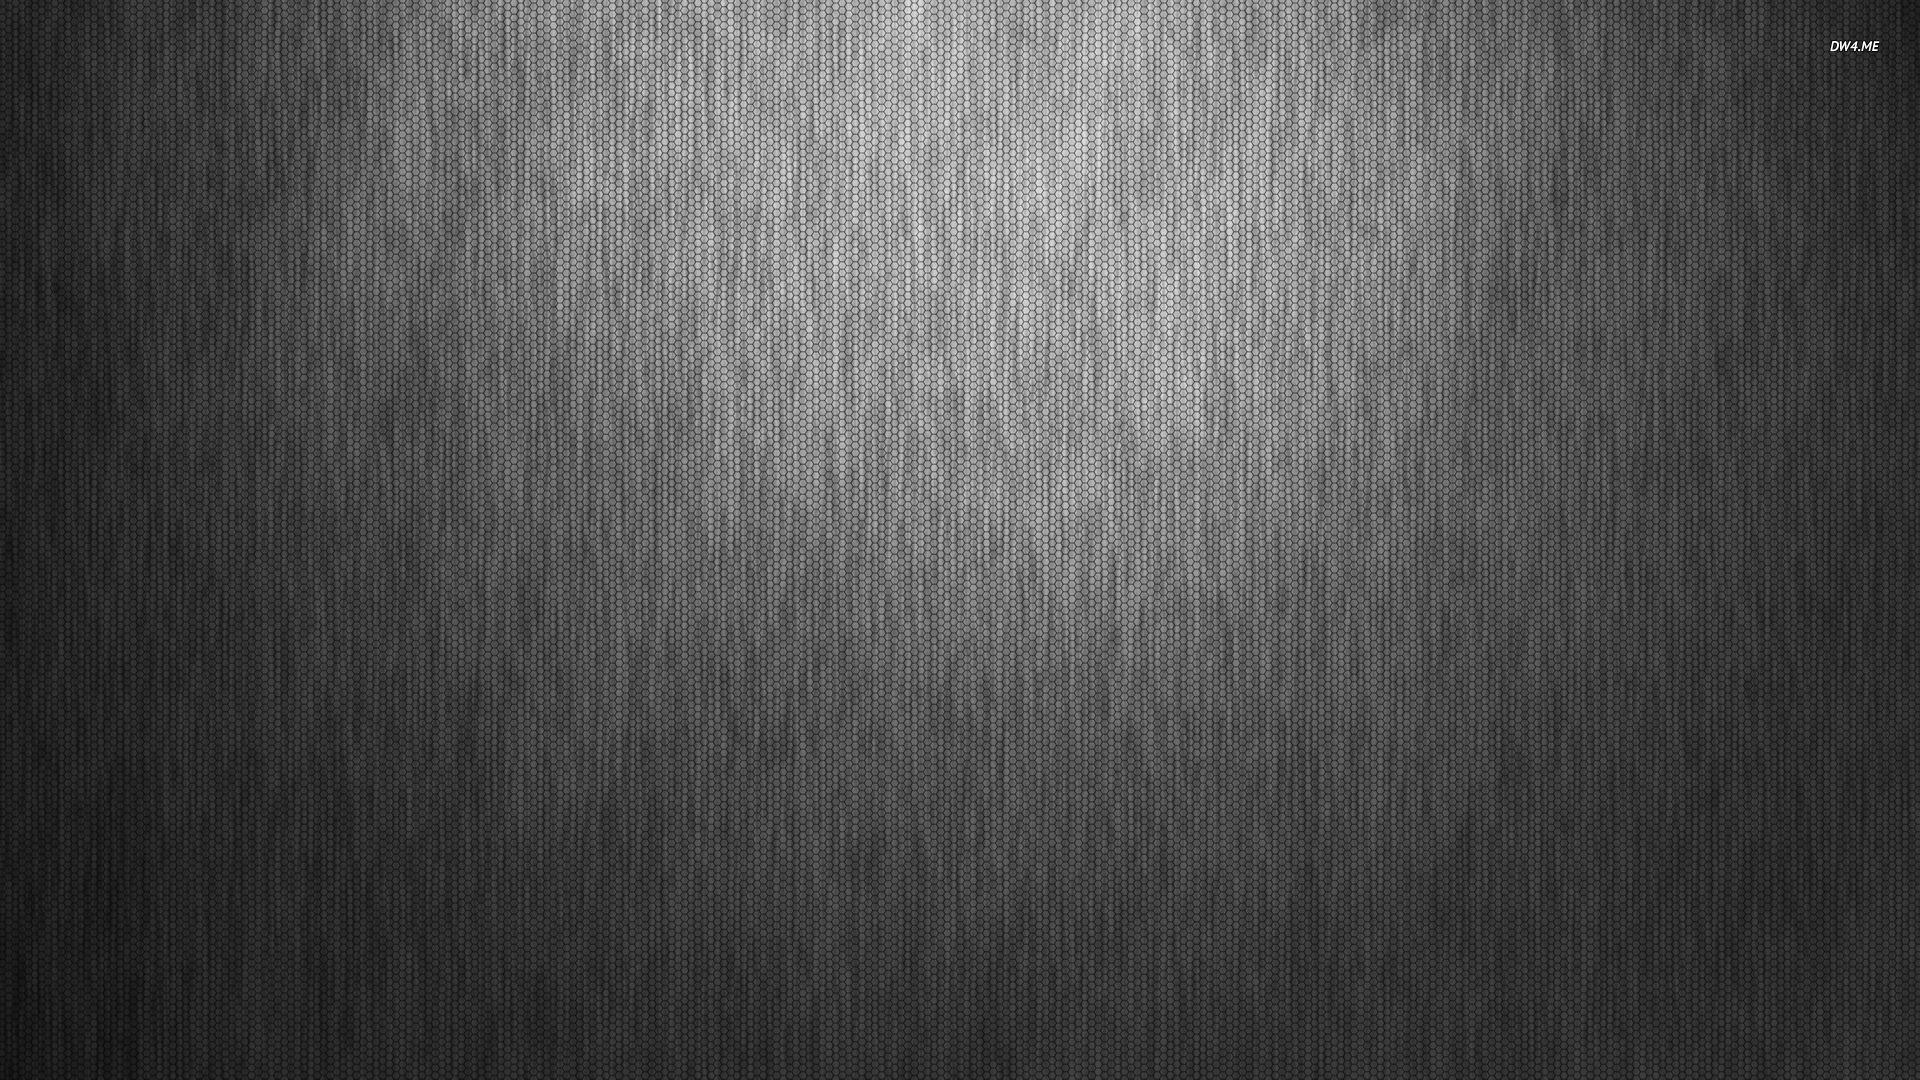 Black Metallic Wallpapers (40 Wallpapers) - Adorable Wallpapers